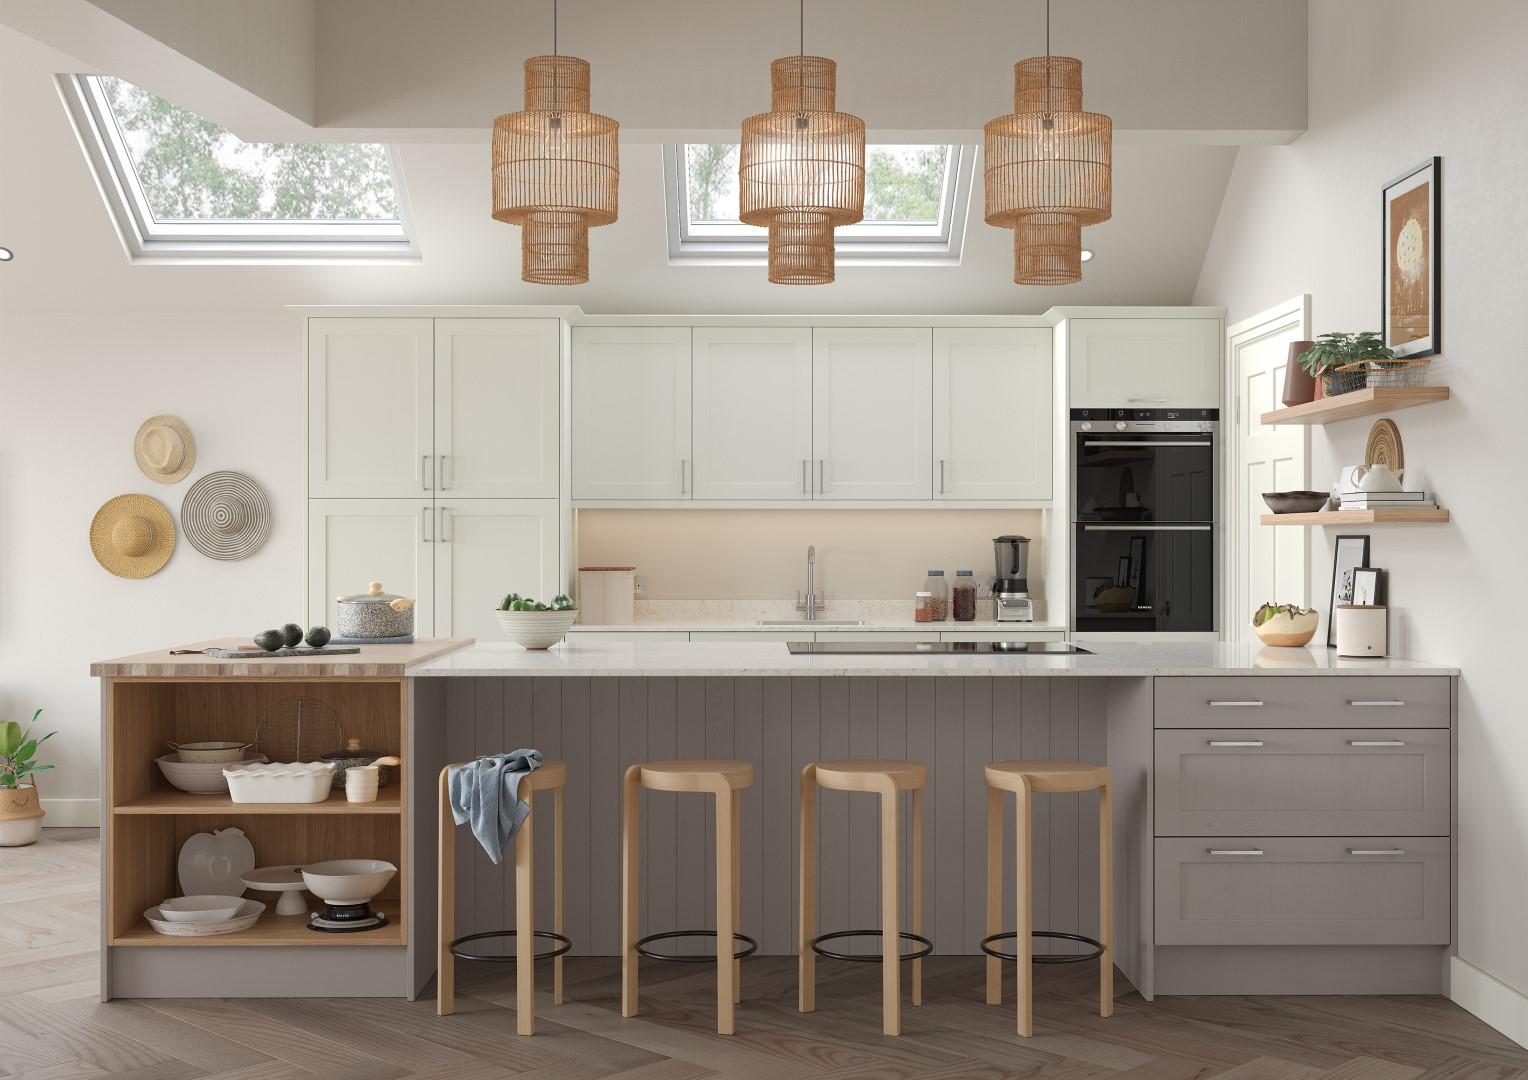 Aldana Porcelain and Cashmere - Kitchen Design - Alan Kelly Kitchens - Waterford - 3